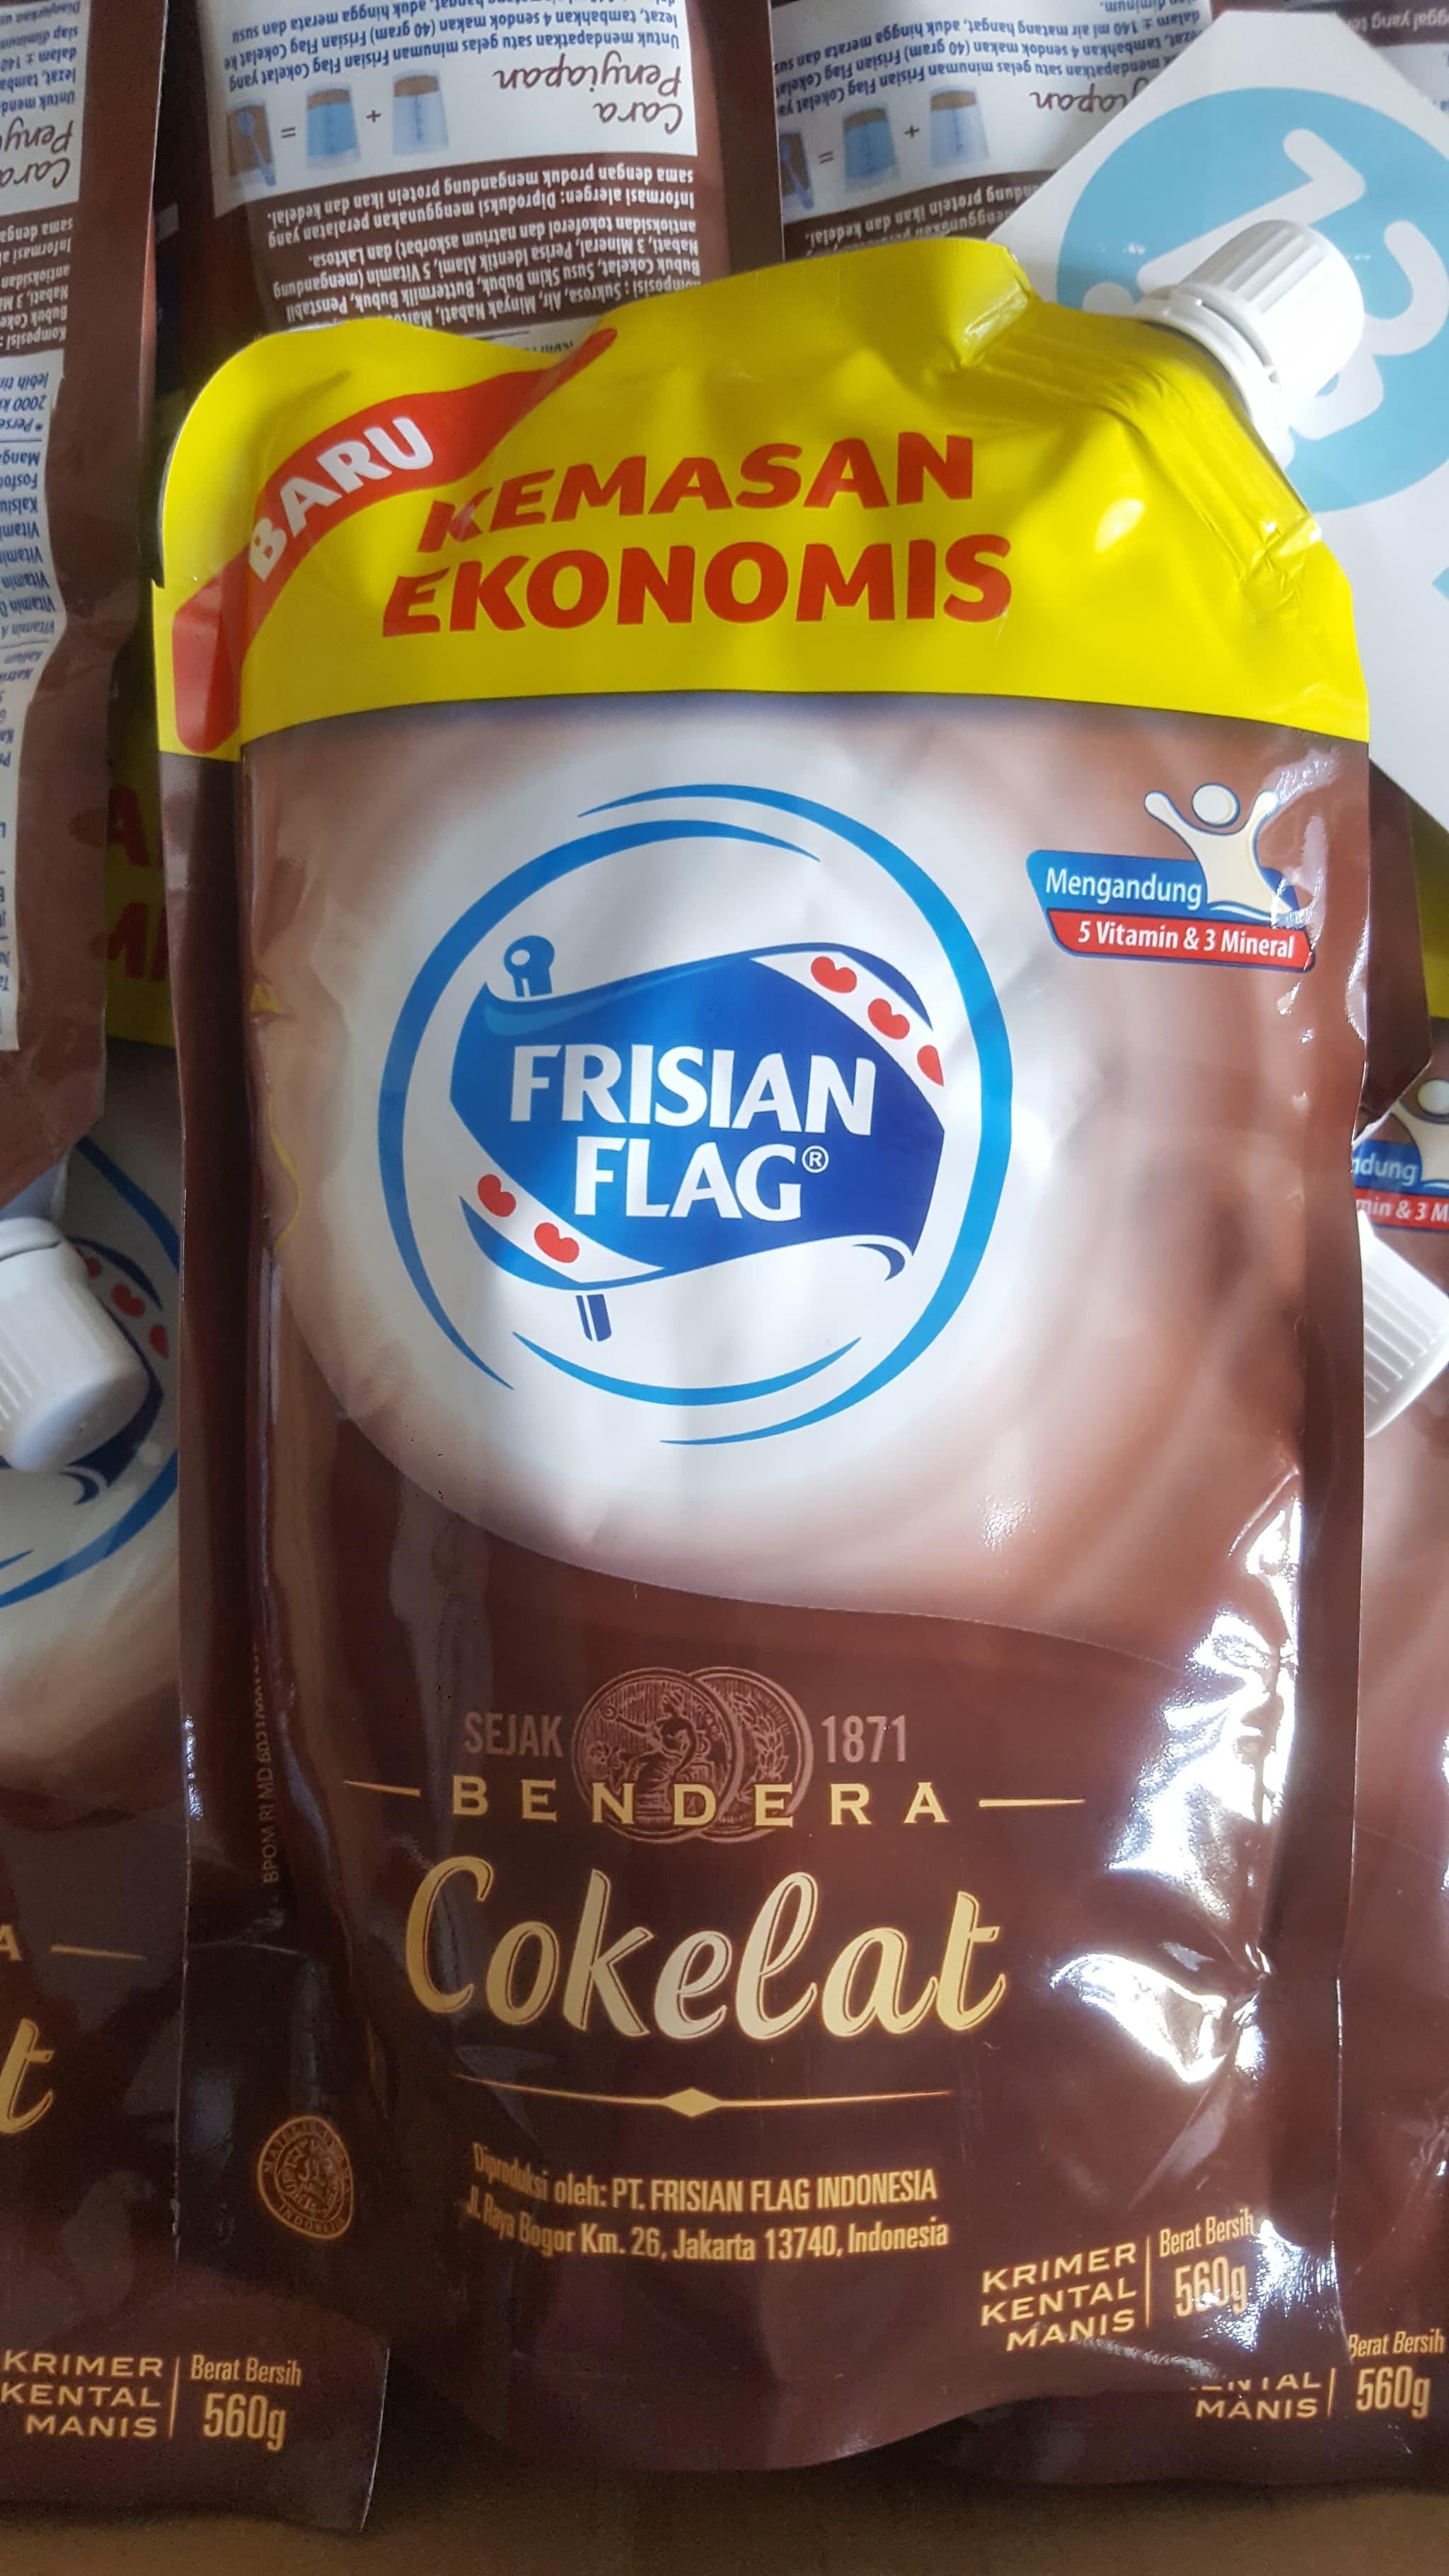 Frisian Flag Susu Kental Manis Cokelat Pouch 560gr Daftar Harga Bendera Scm Choco 490 Gr Kemasan Ekonomis